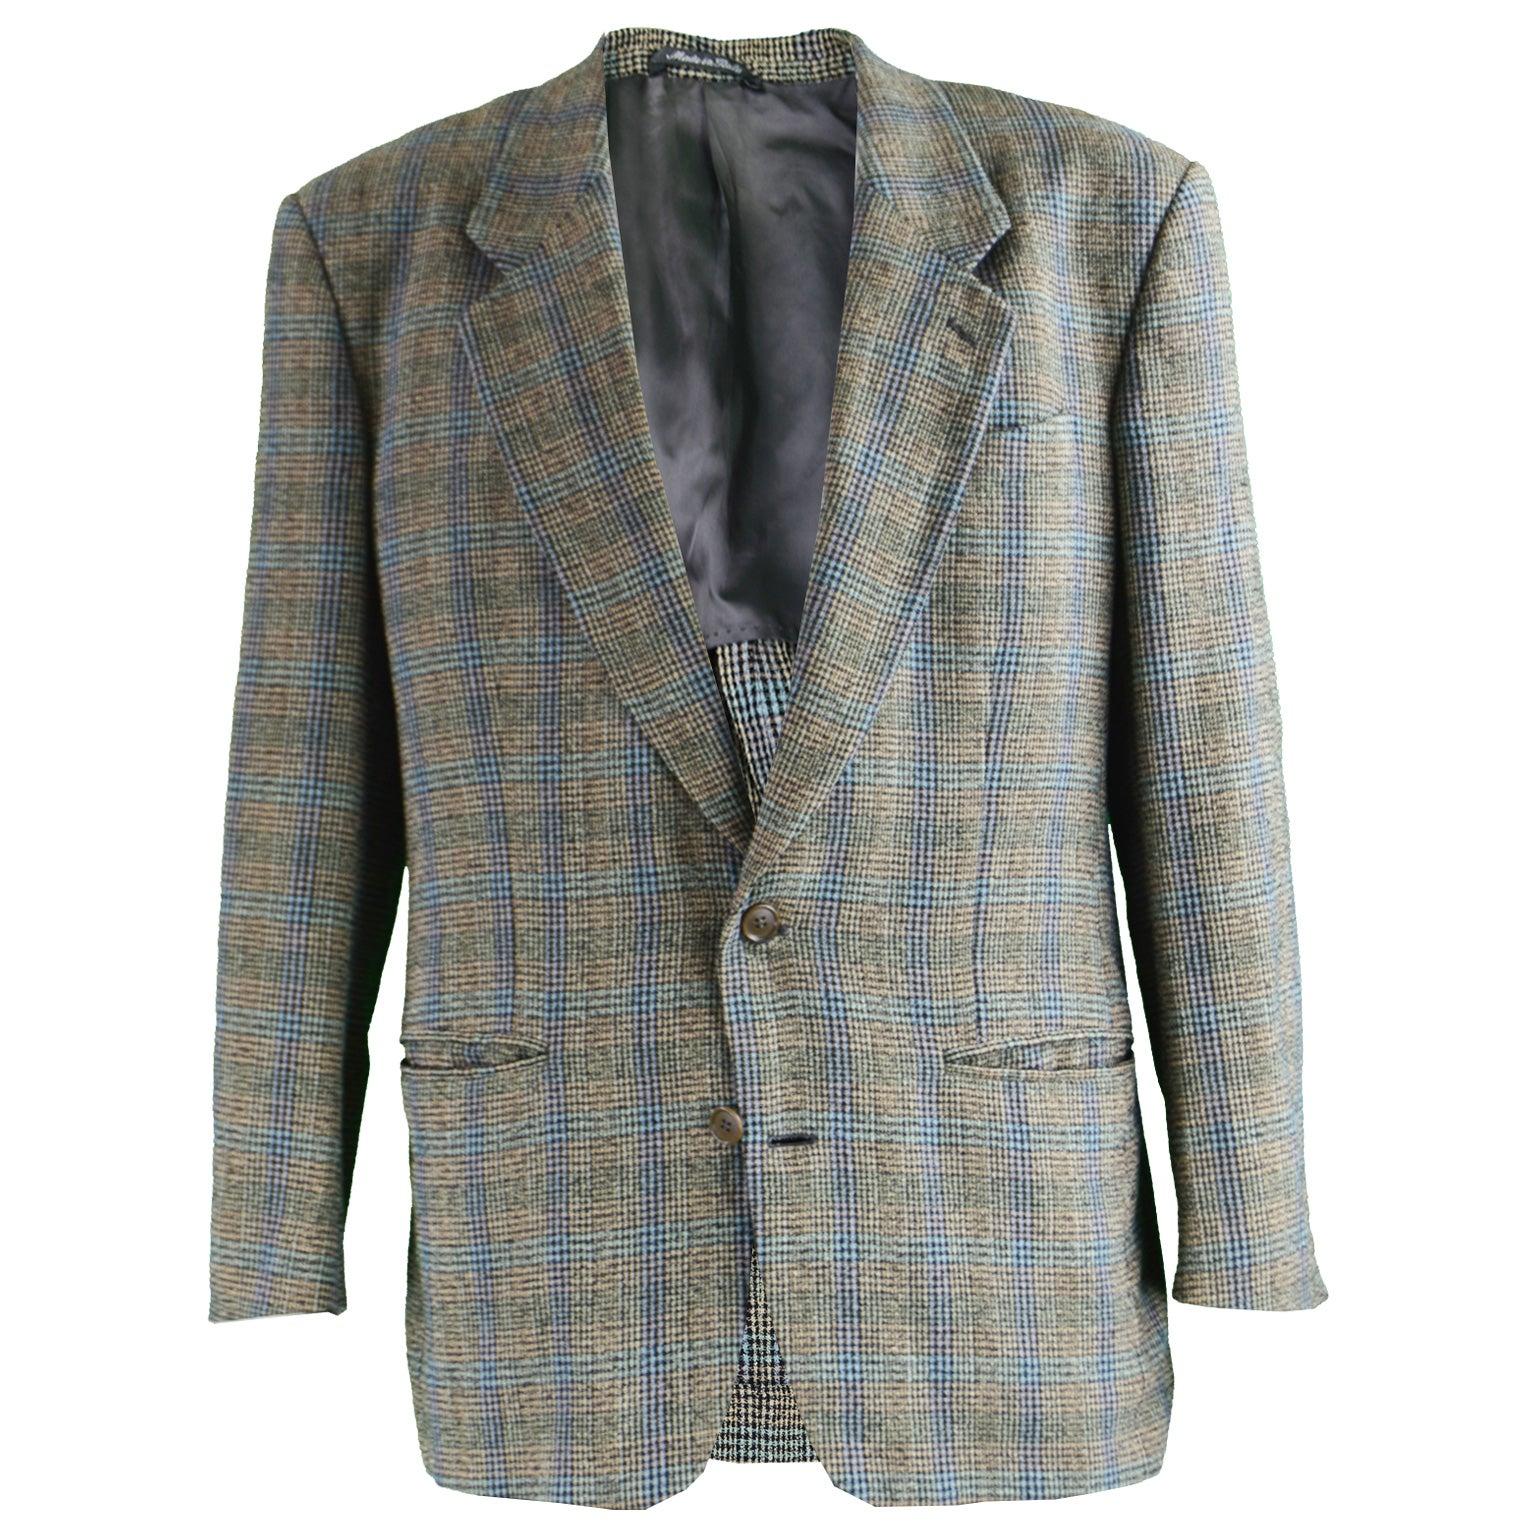 wholesale dealer 224cb b0812 Missoni Uomo Vintage Men's Multicoloured Checked Wool Sport Coat, 1980s